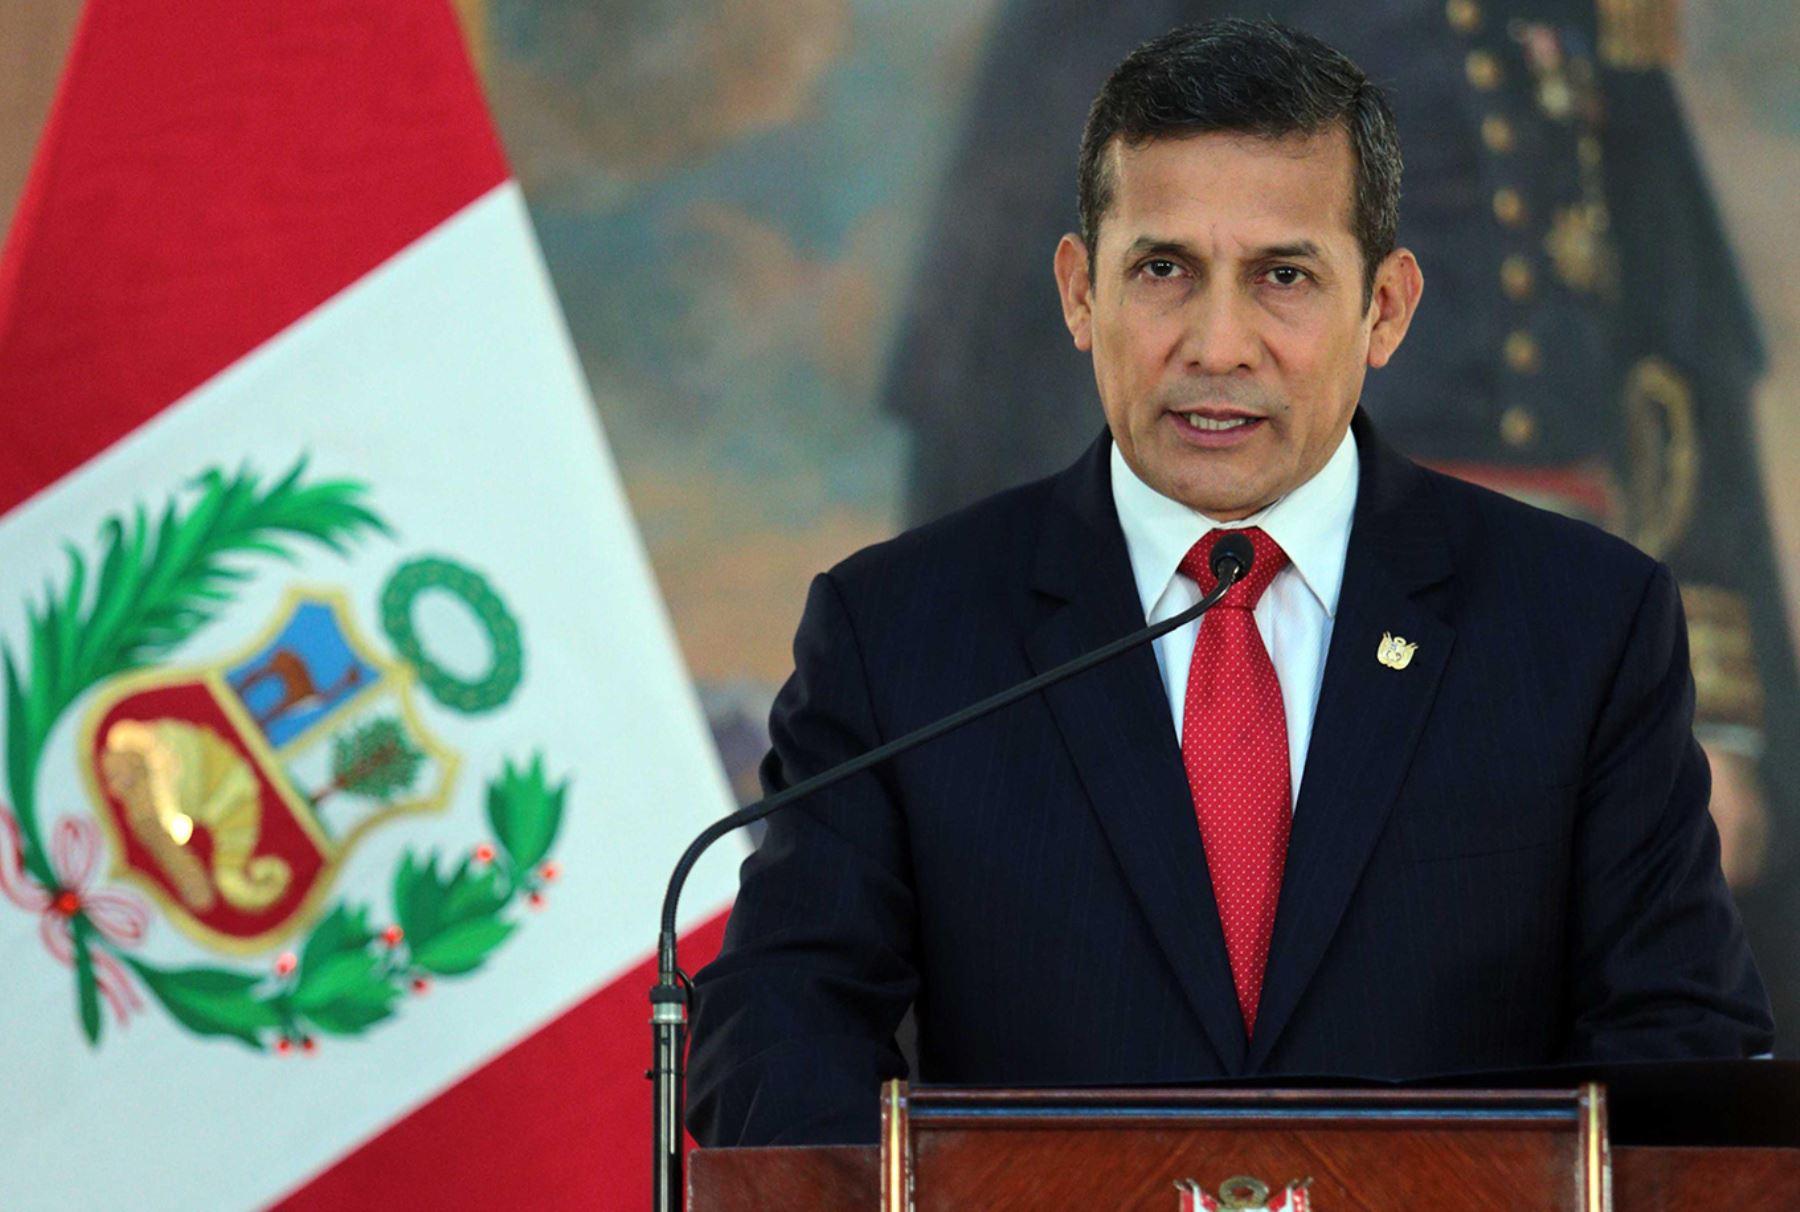 Presidente Ollanta Humala da por concluido caso de espionaje de Chile (ampliación)   Noticias   Agencia Peruana de Noticias Andina